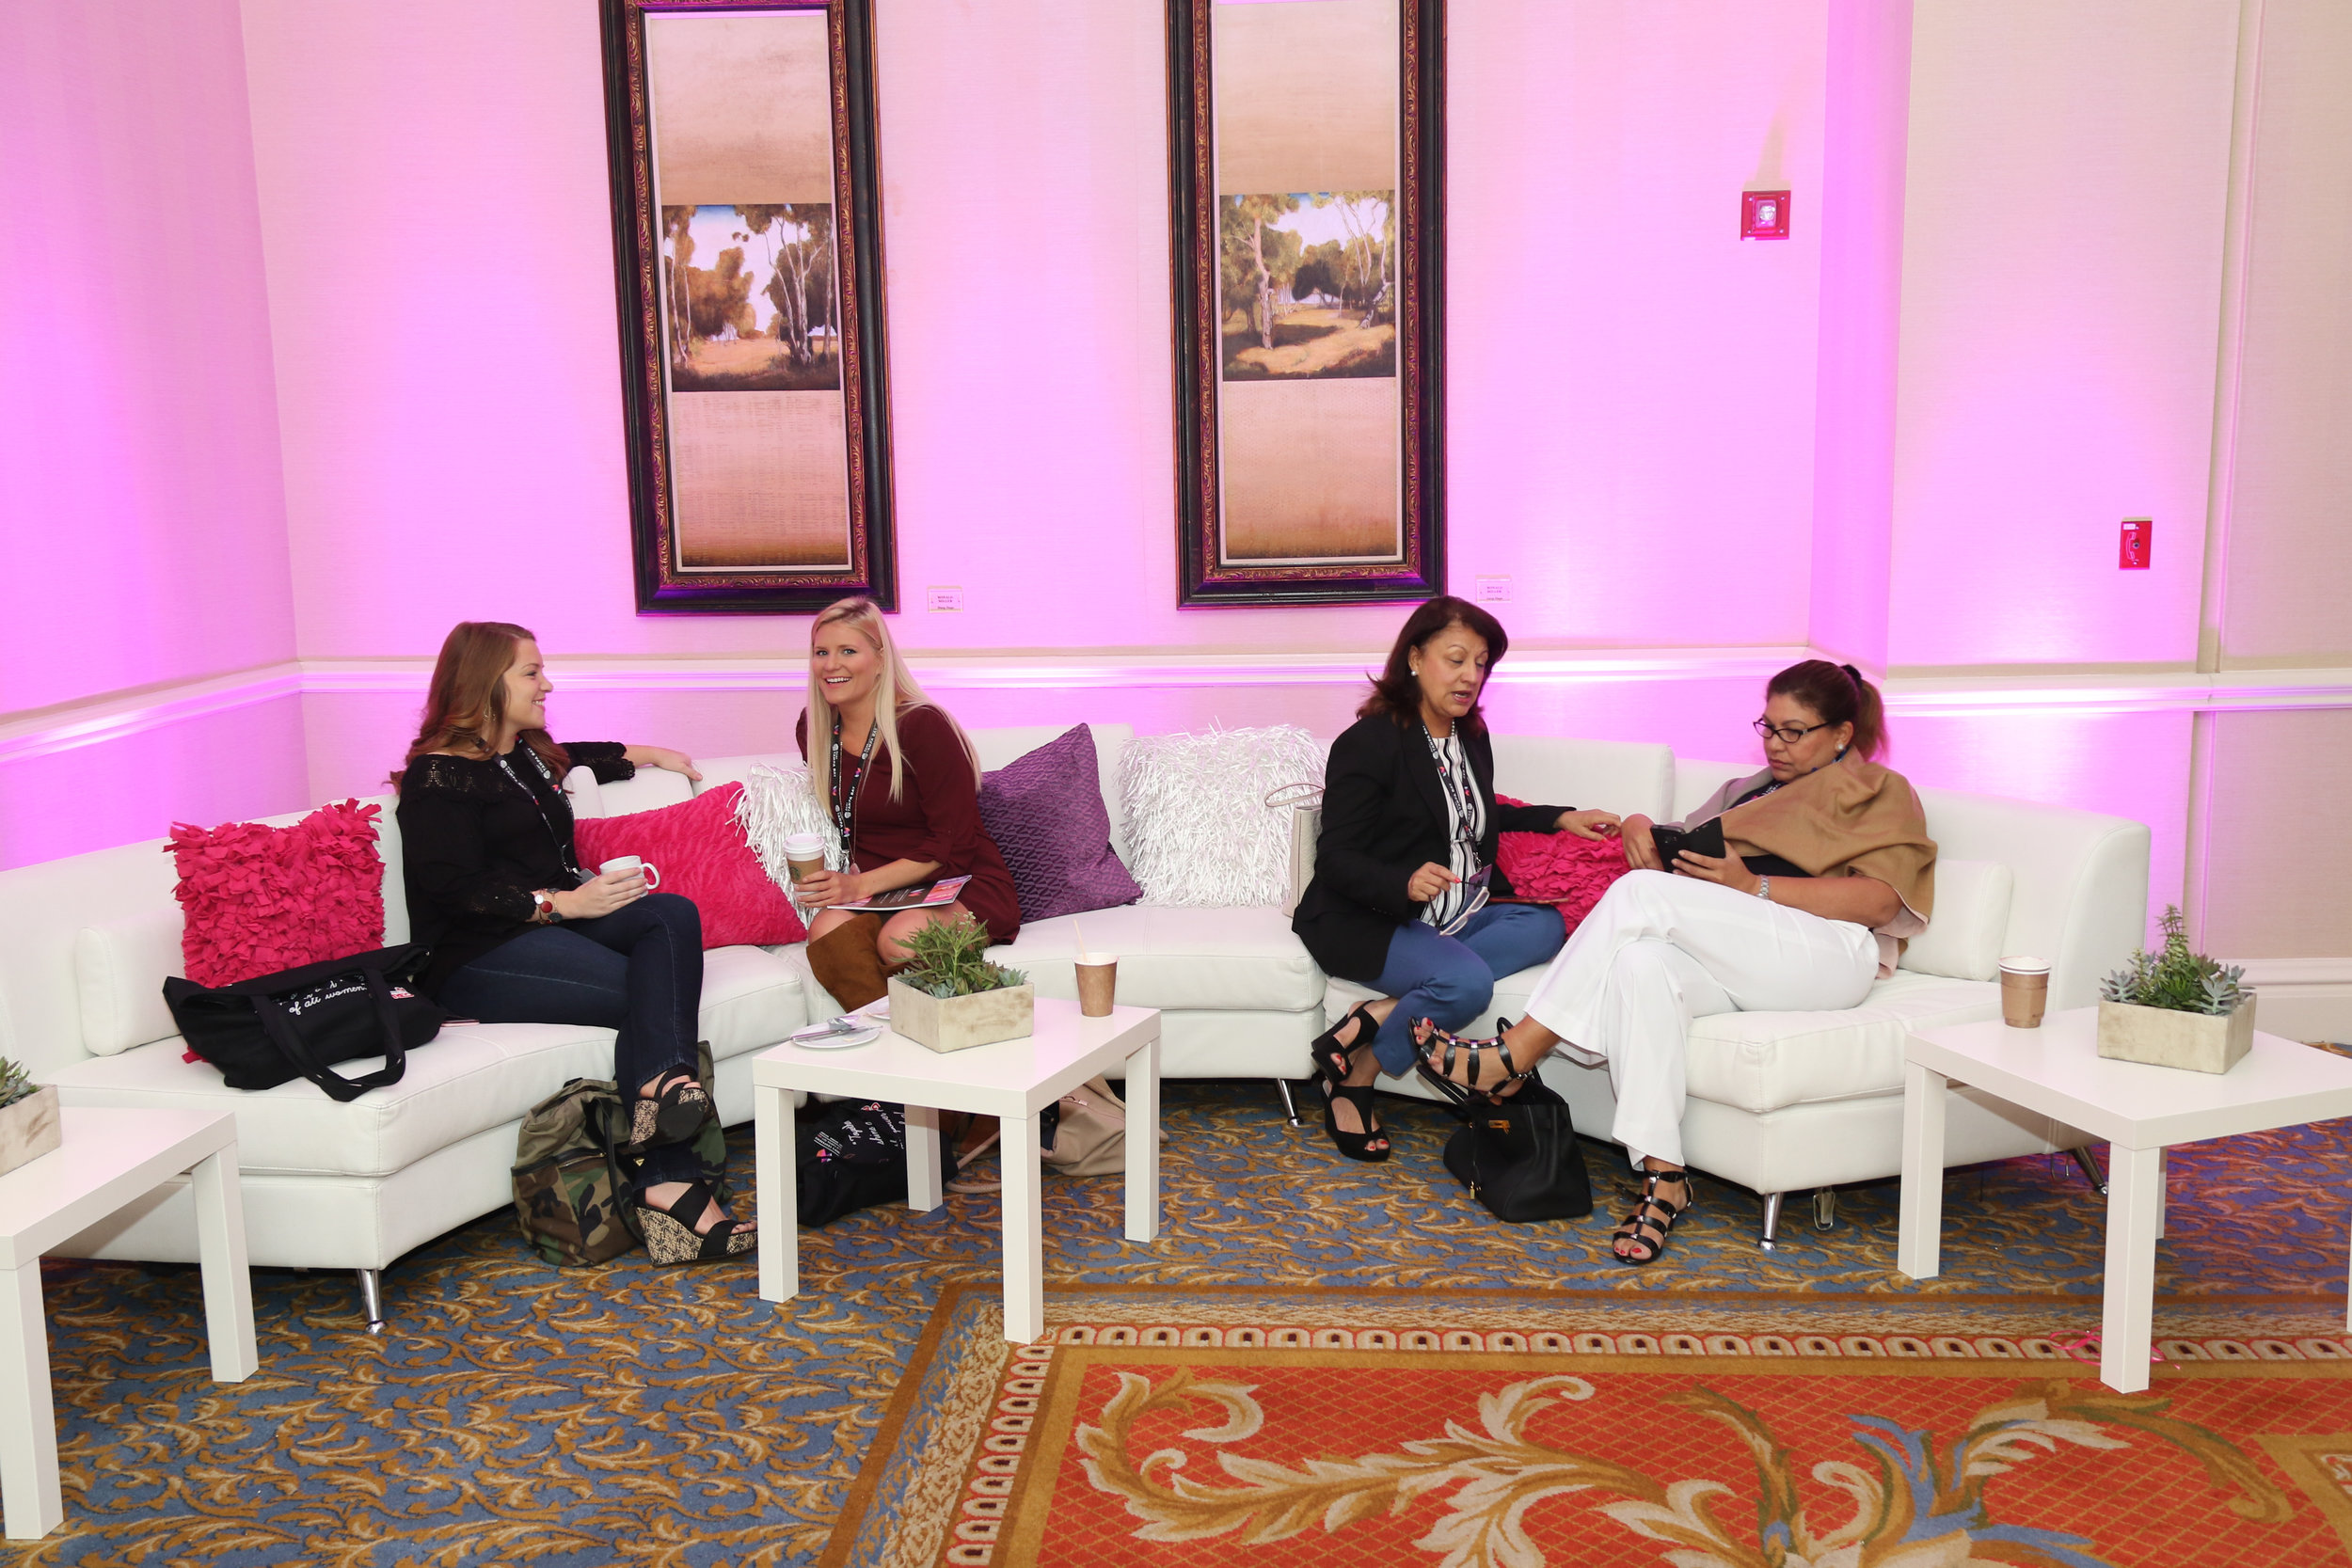 445_WomensConference_10-27-17.jpg